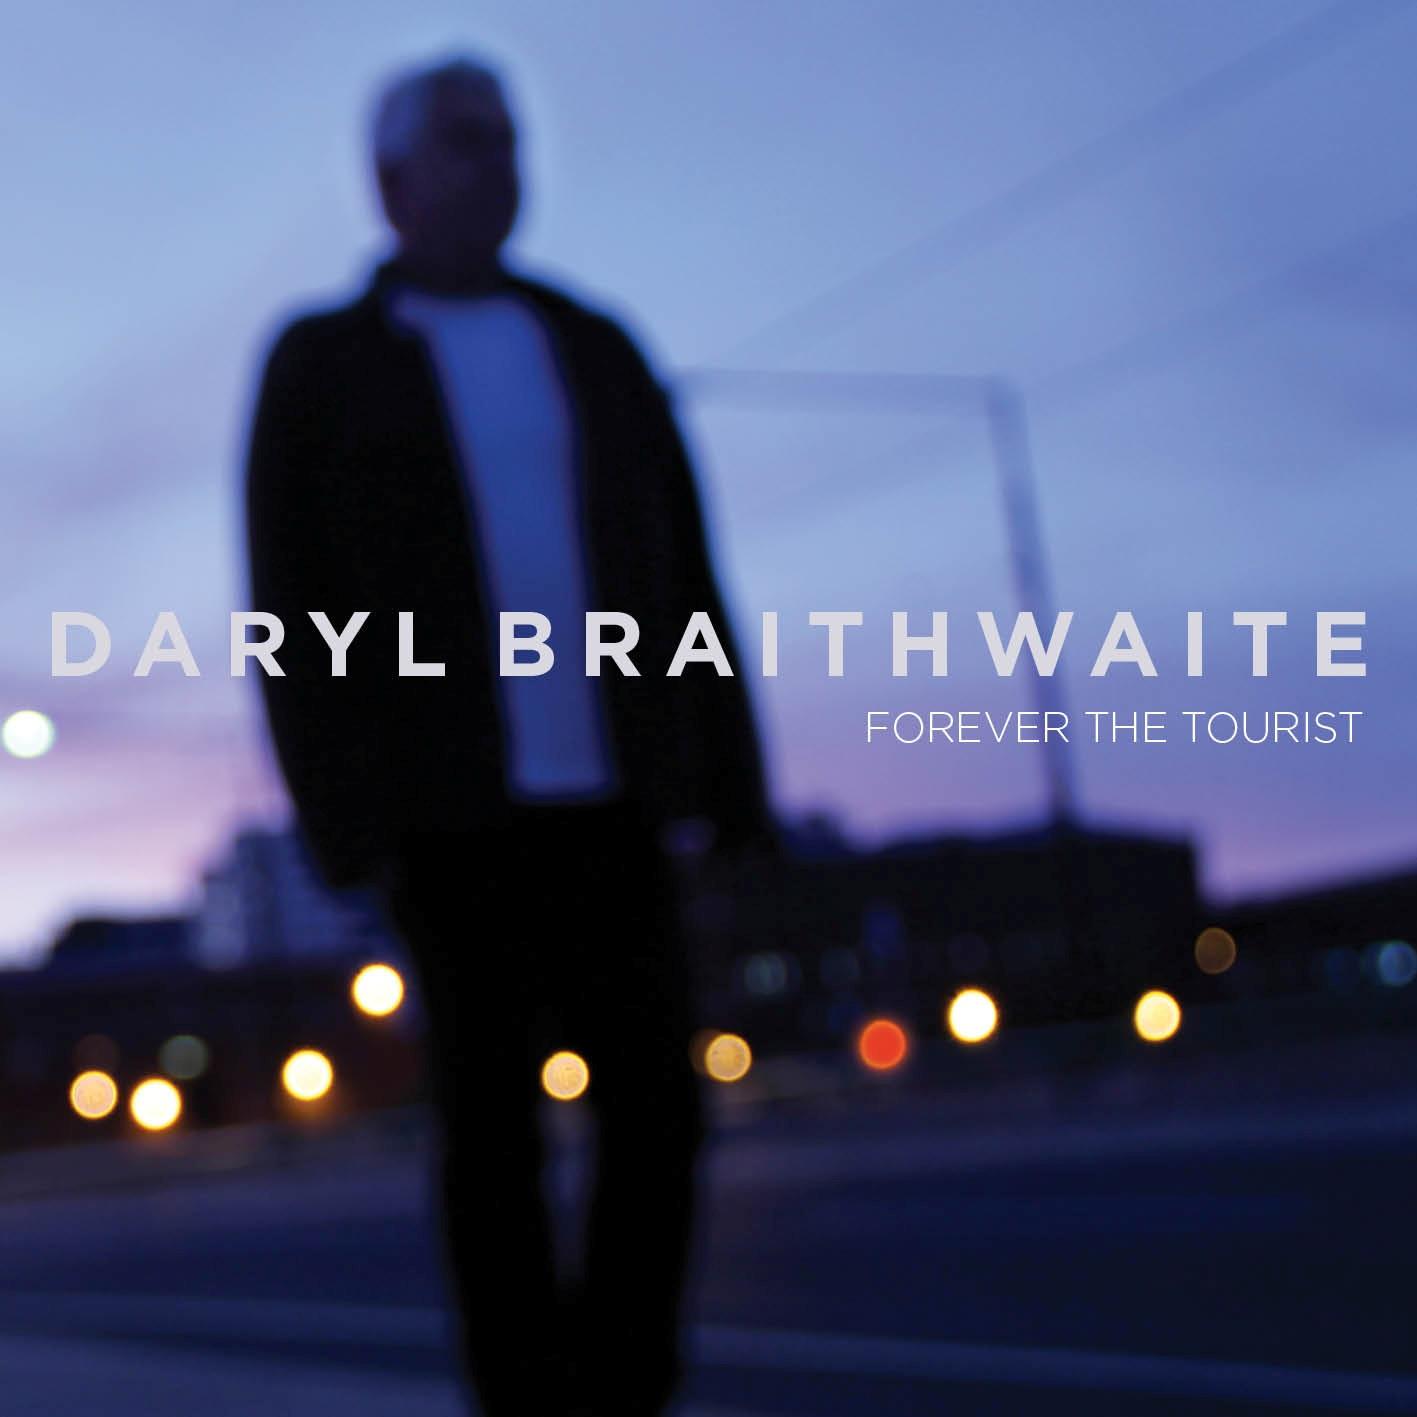 Australian music legend DARYL BRAITHWAITE announces New Mini Album FOREVER THE TOURIST to be released  4th October, 2013